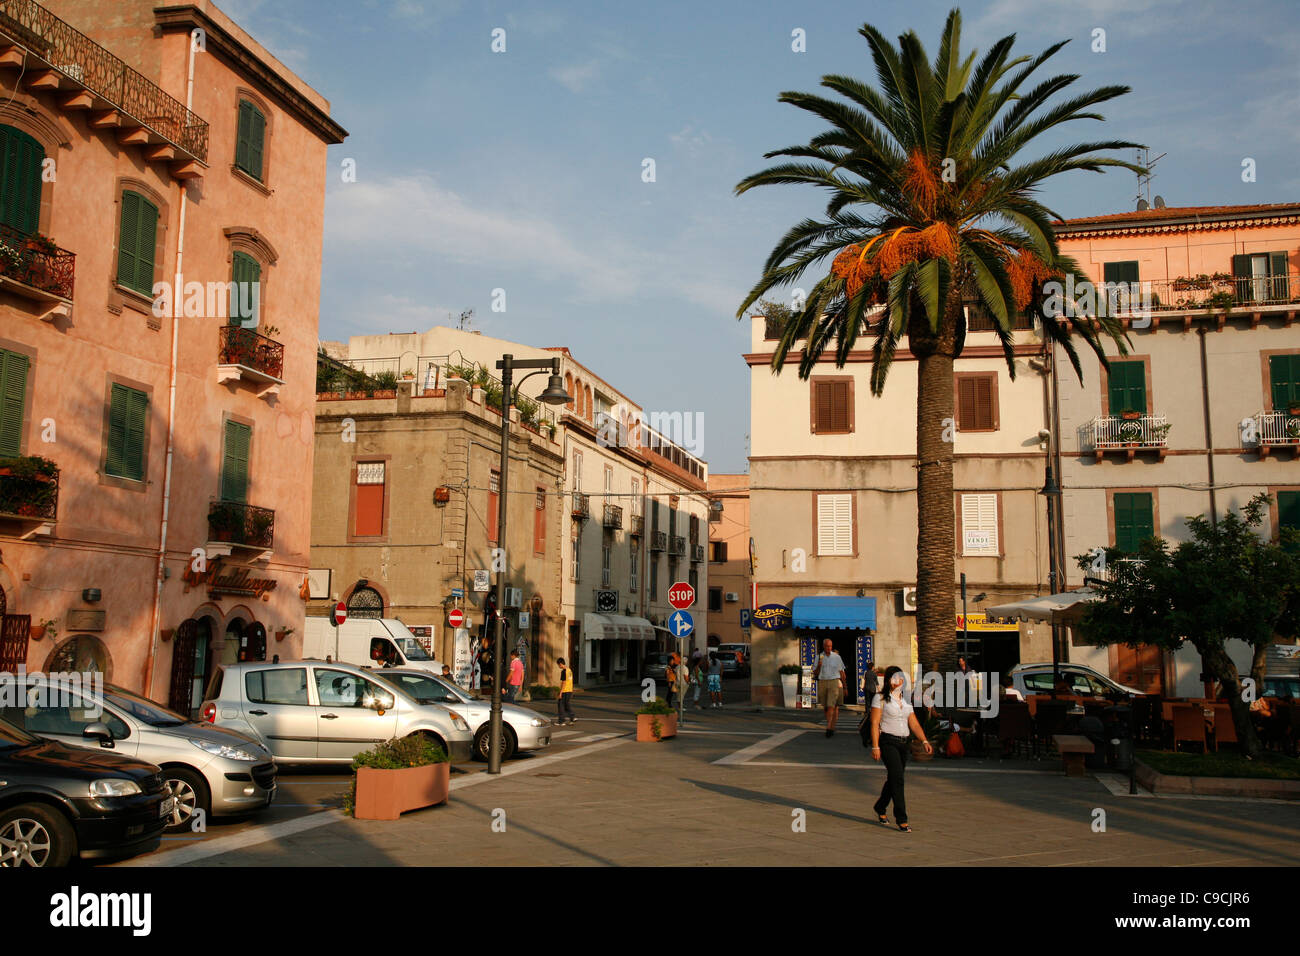 Piazza IV Novembre, the main square in Bosa, Sardinia, Italy. - Stock Image